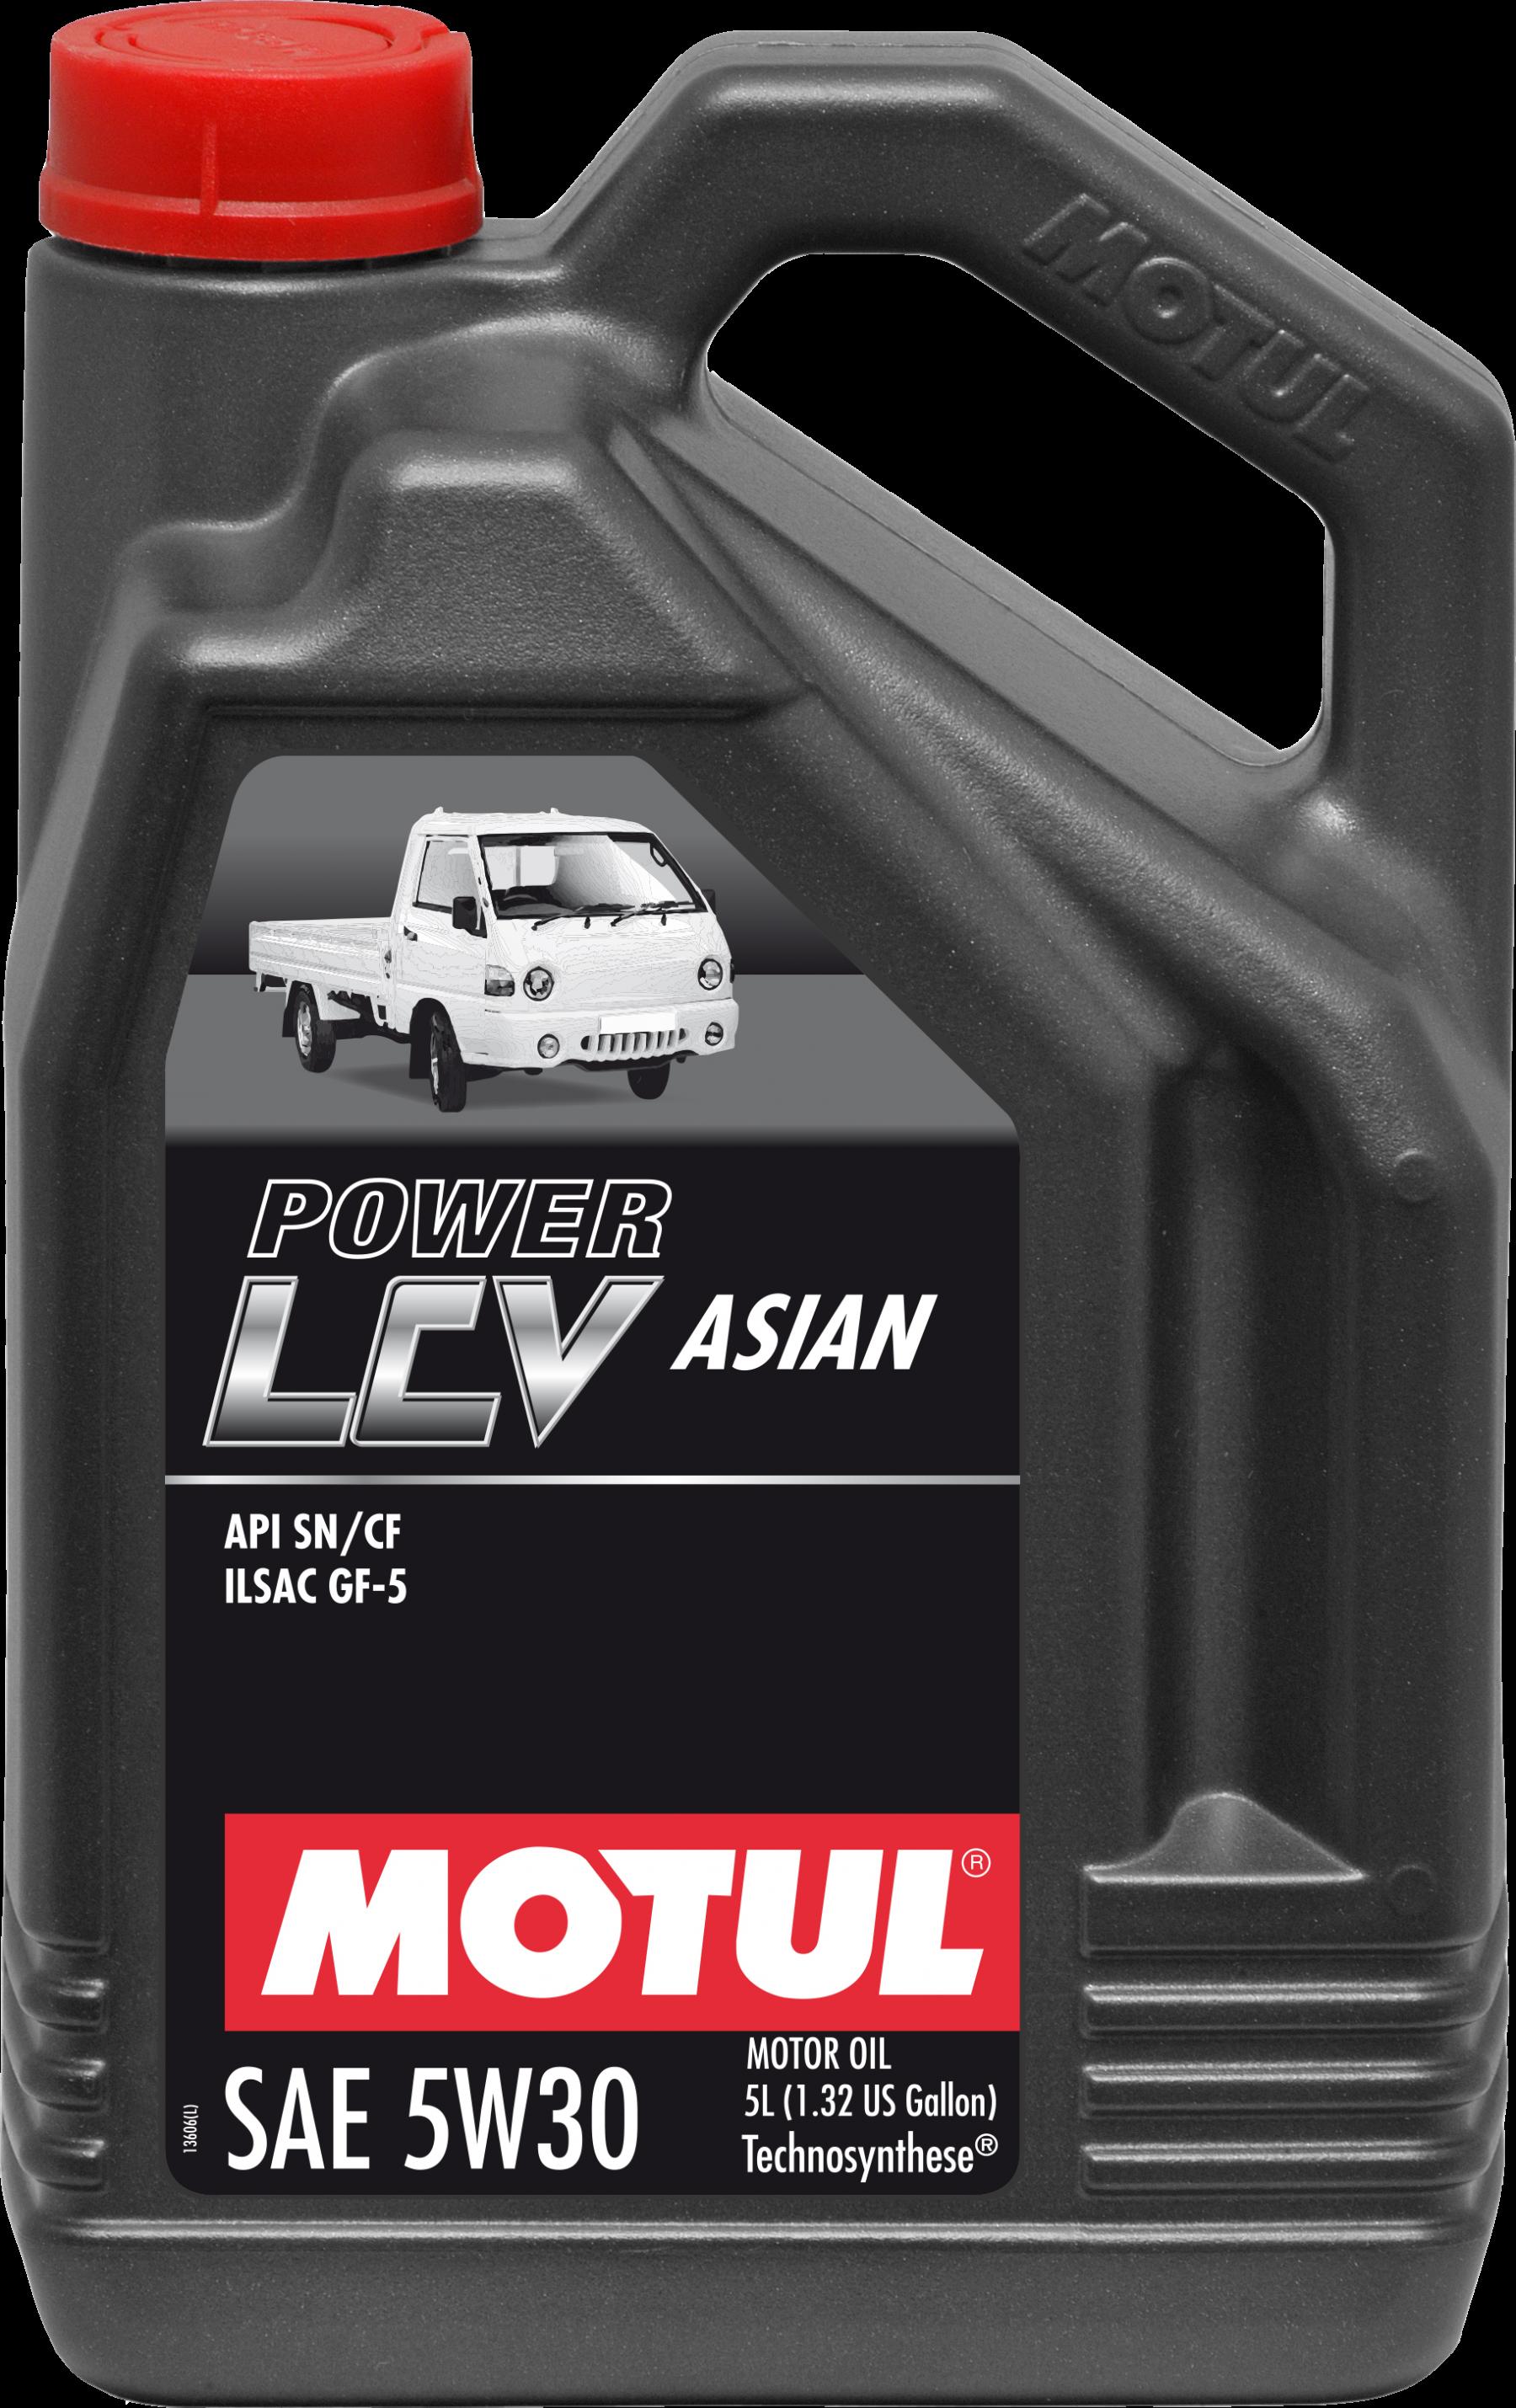 Motul Power LCV Asian 5w-30